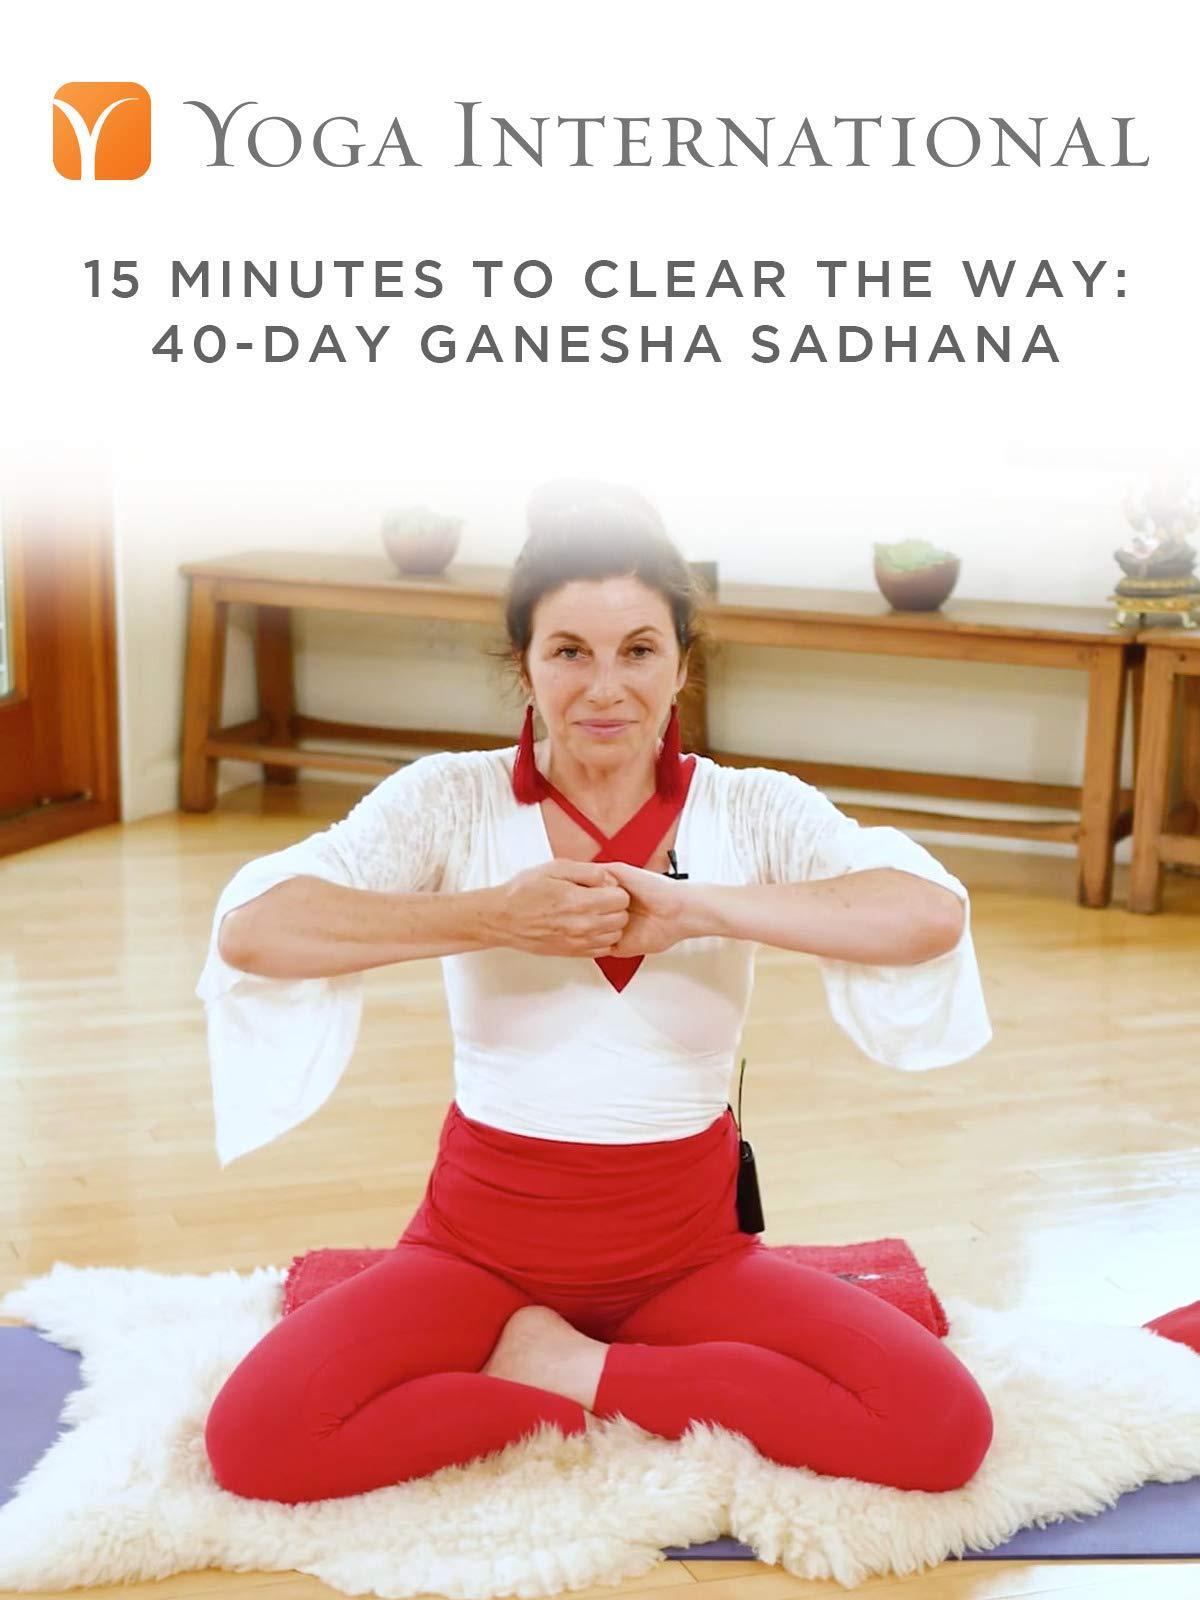 15 Minutes to Clear the Way: 40-Day Ganesha Sadhana